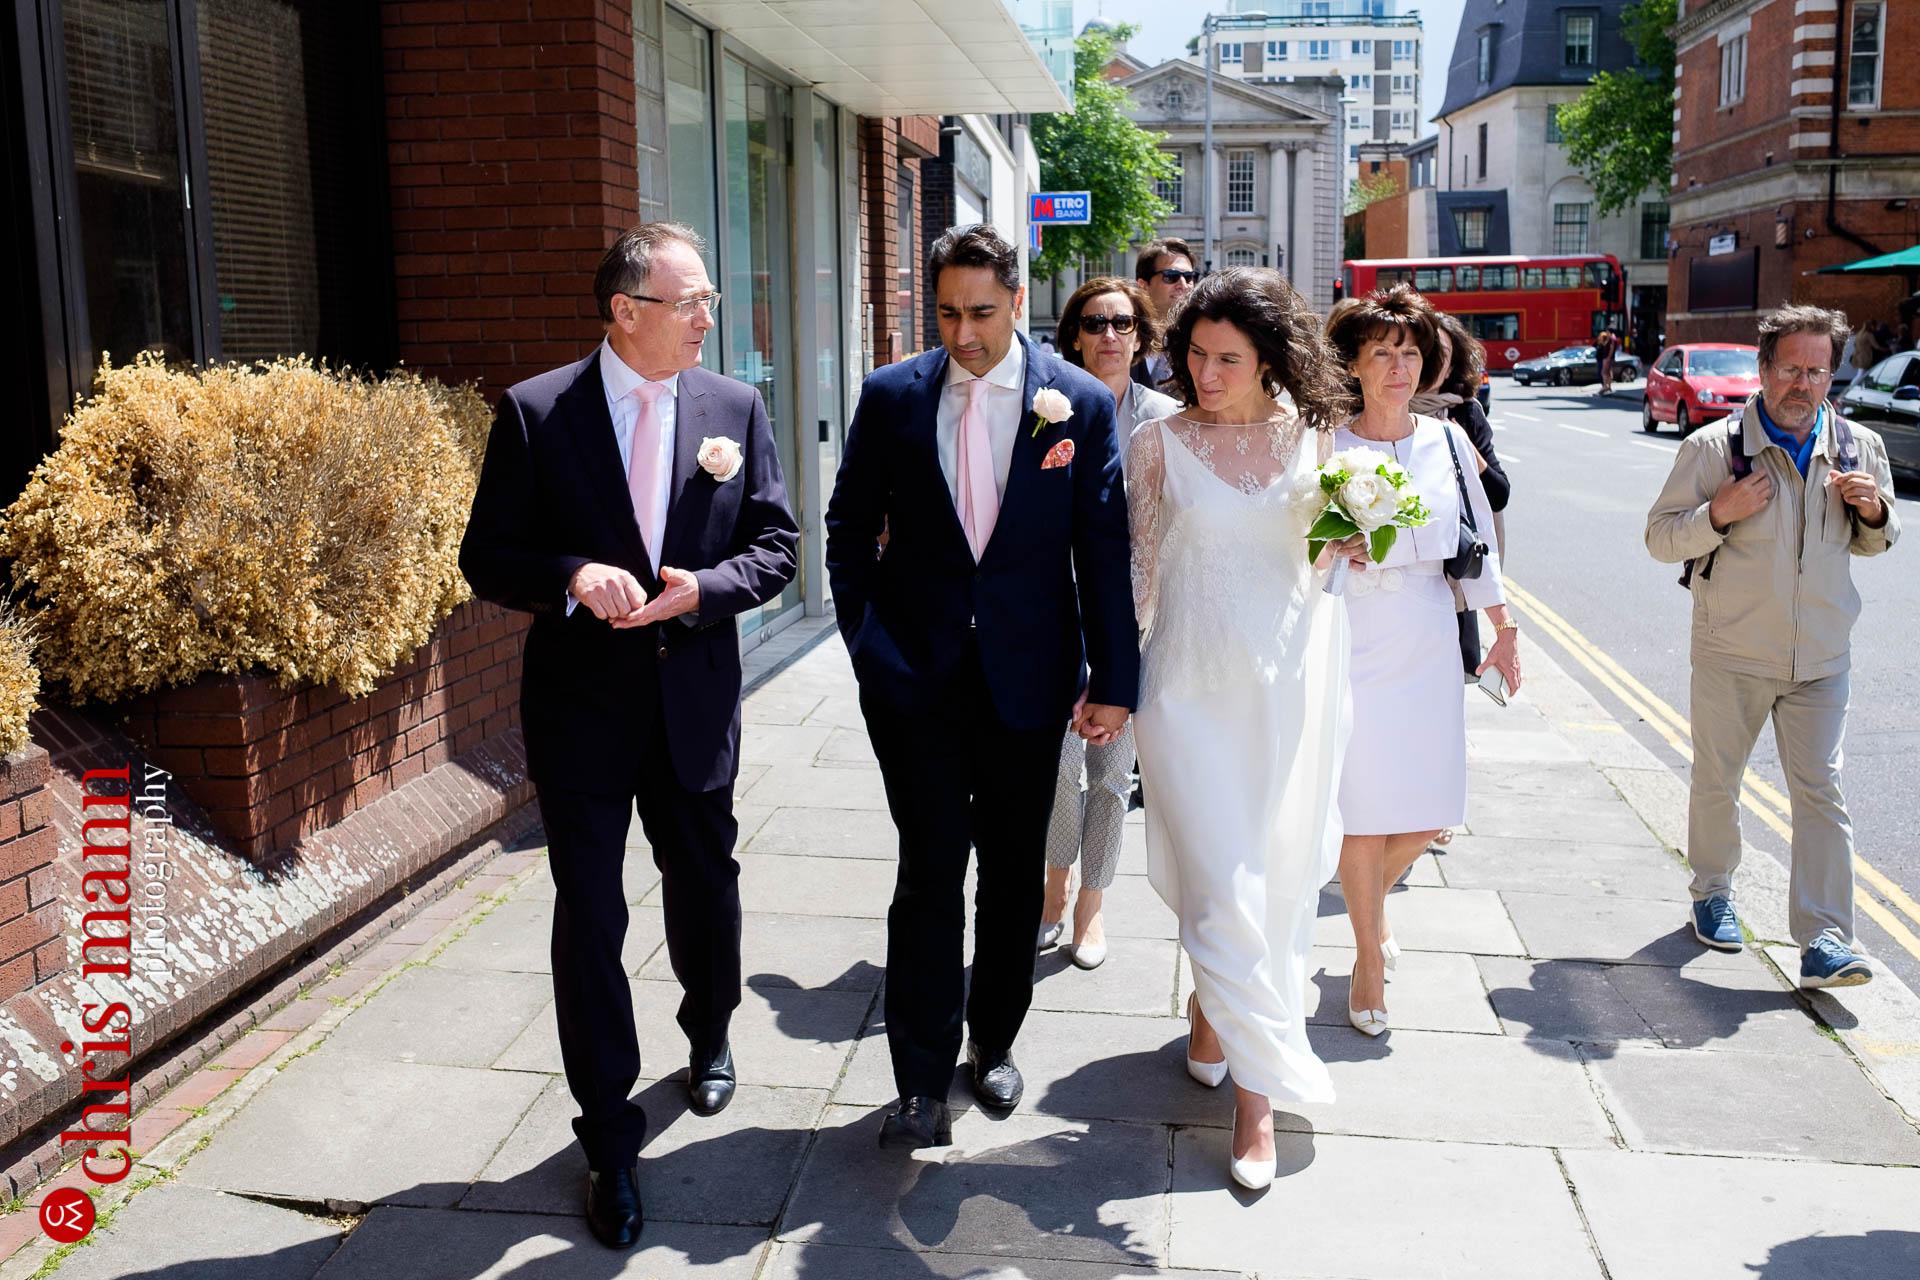 Chelsea-registry-office-wedding-022